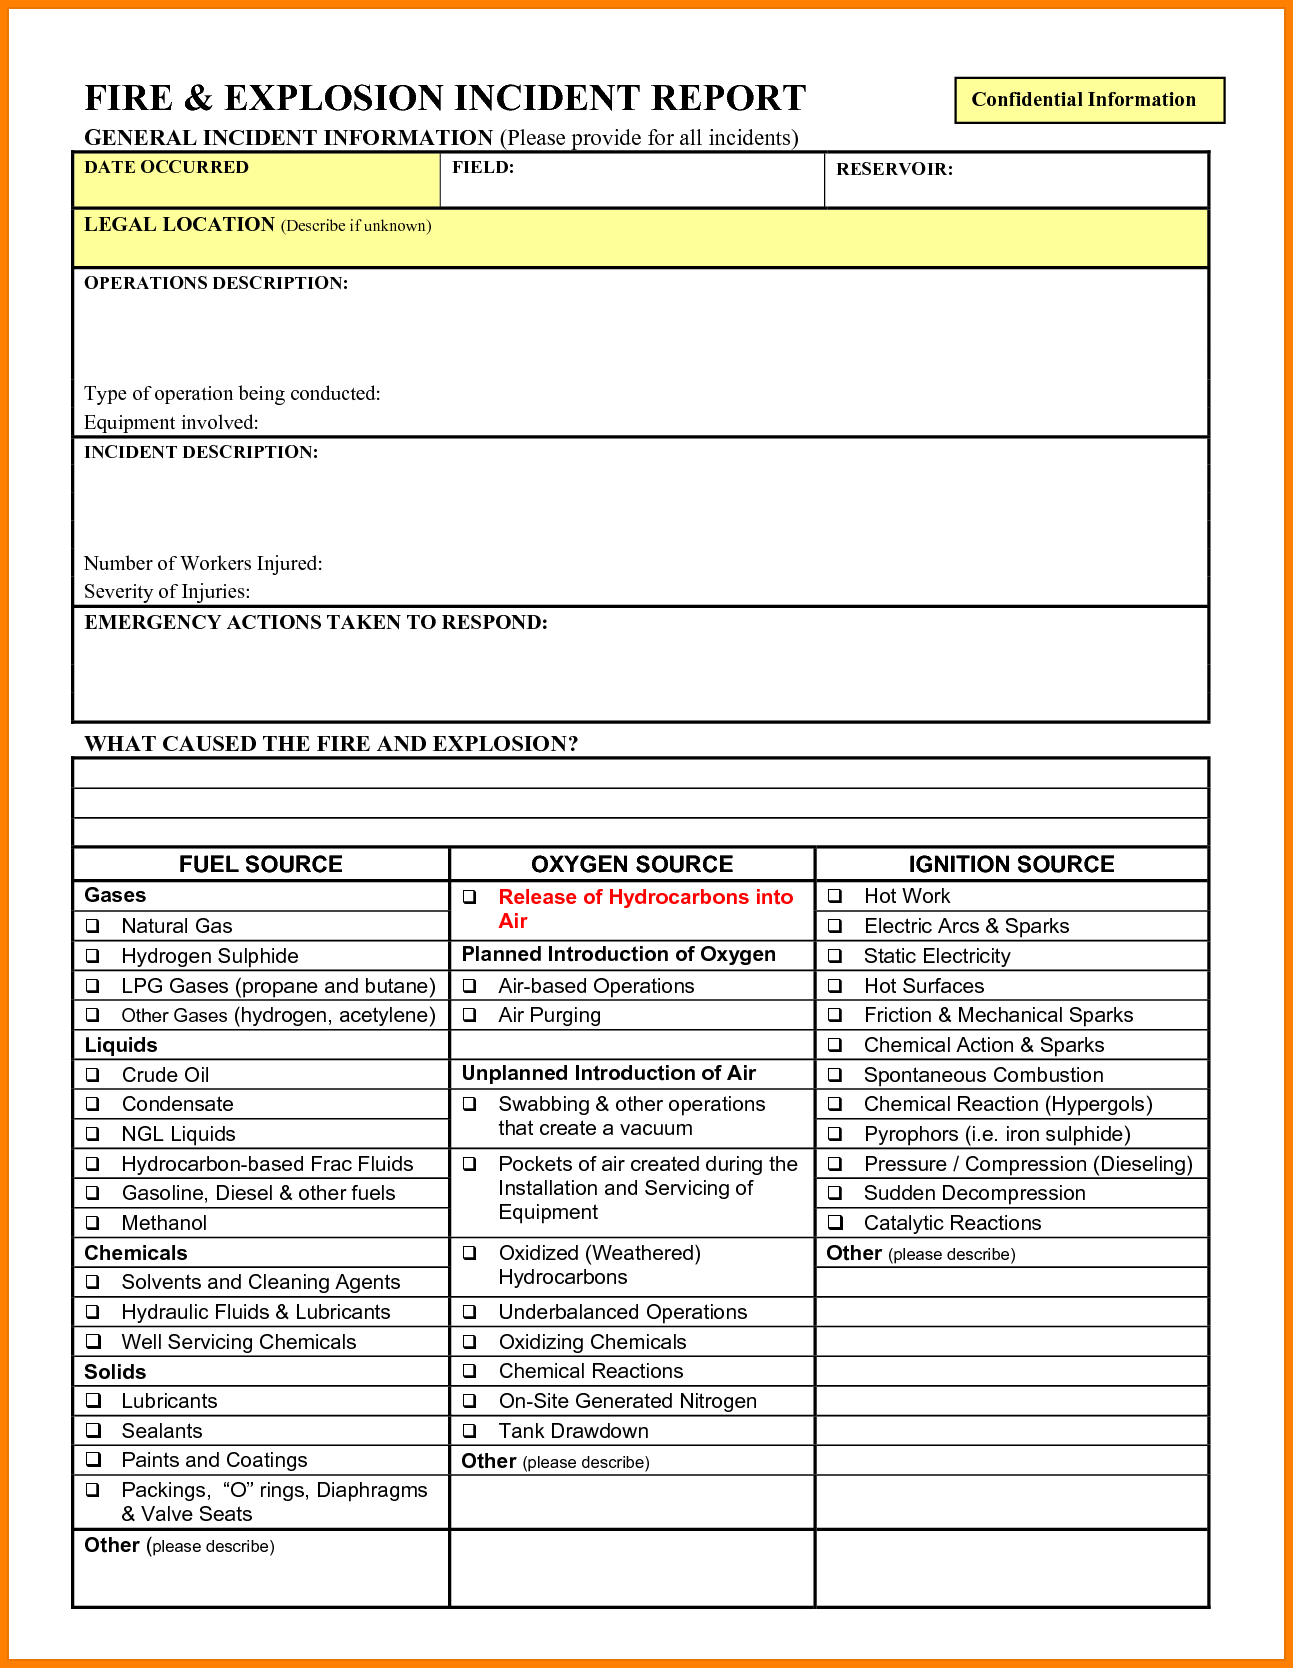 Cal Fire Incident Report Form Immix Zypop  Home Design Idea